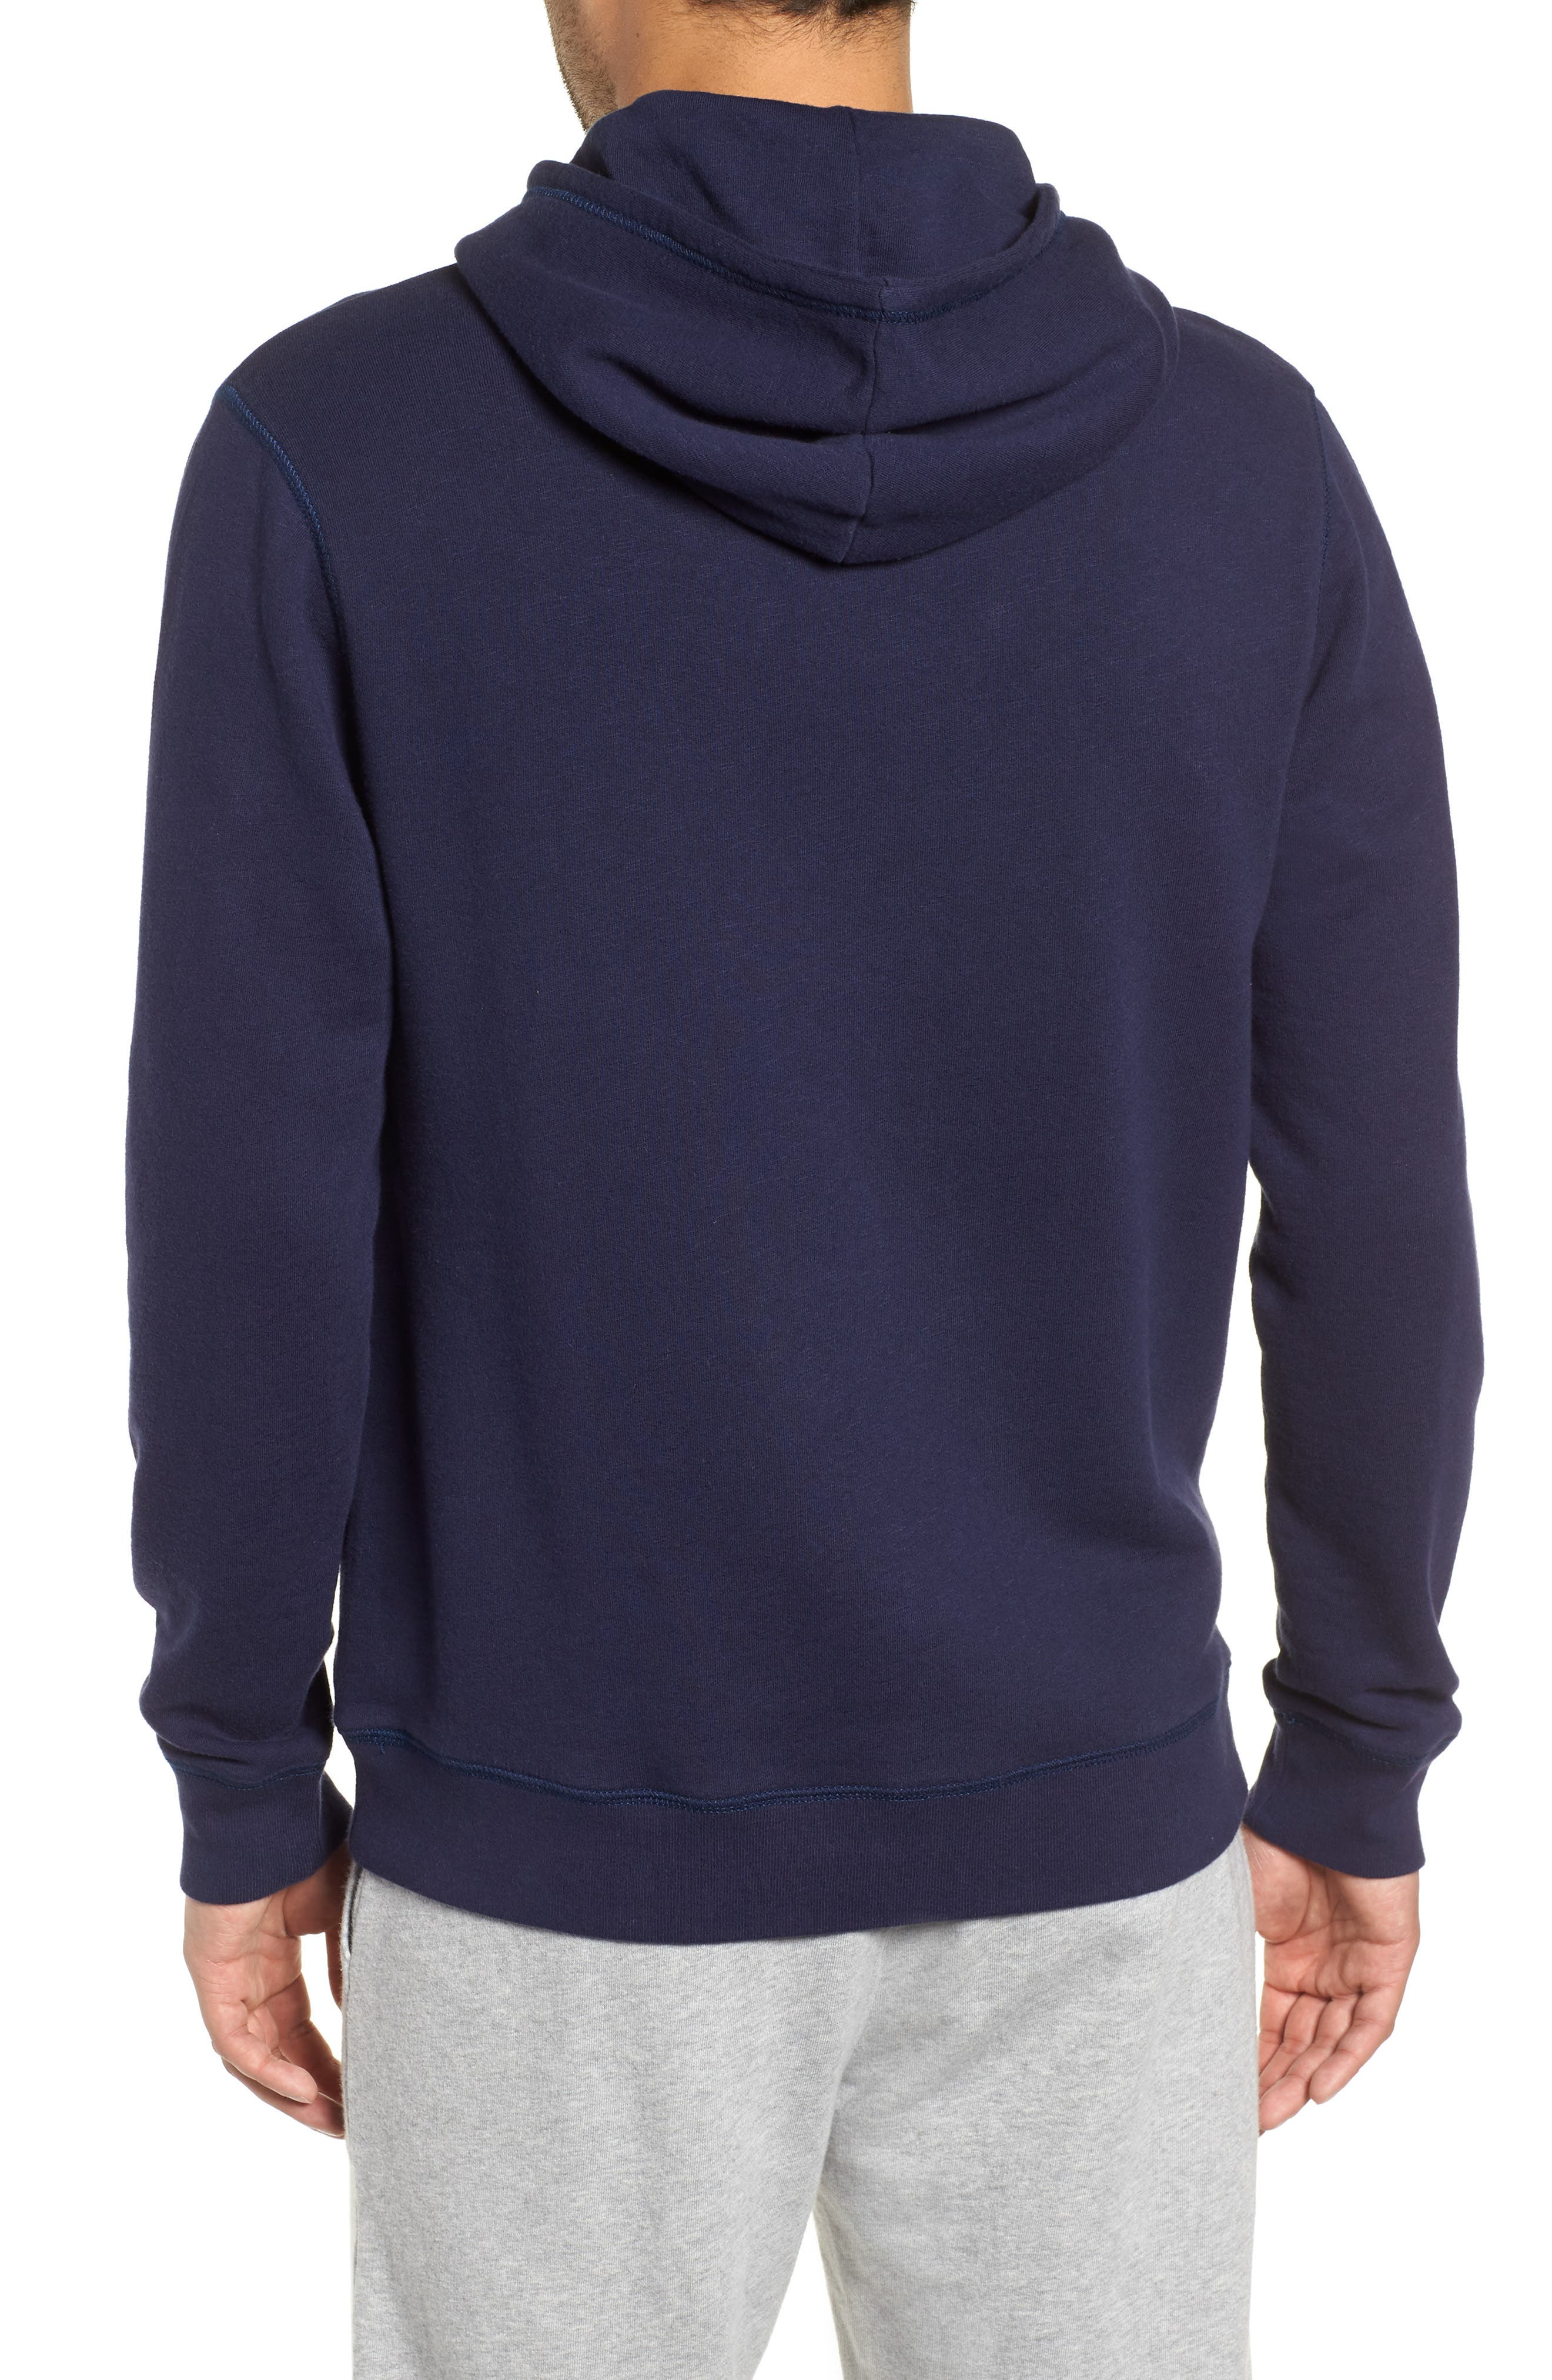 THE RAIL,                             Hooded Sweatshirt,                             Alternate thumbnail 2, color,                             410